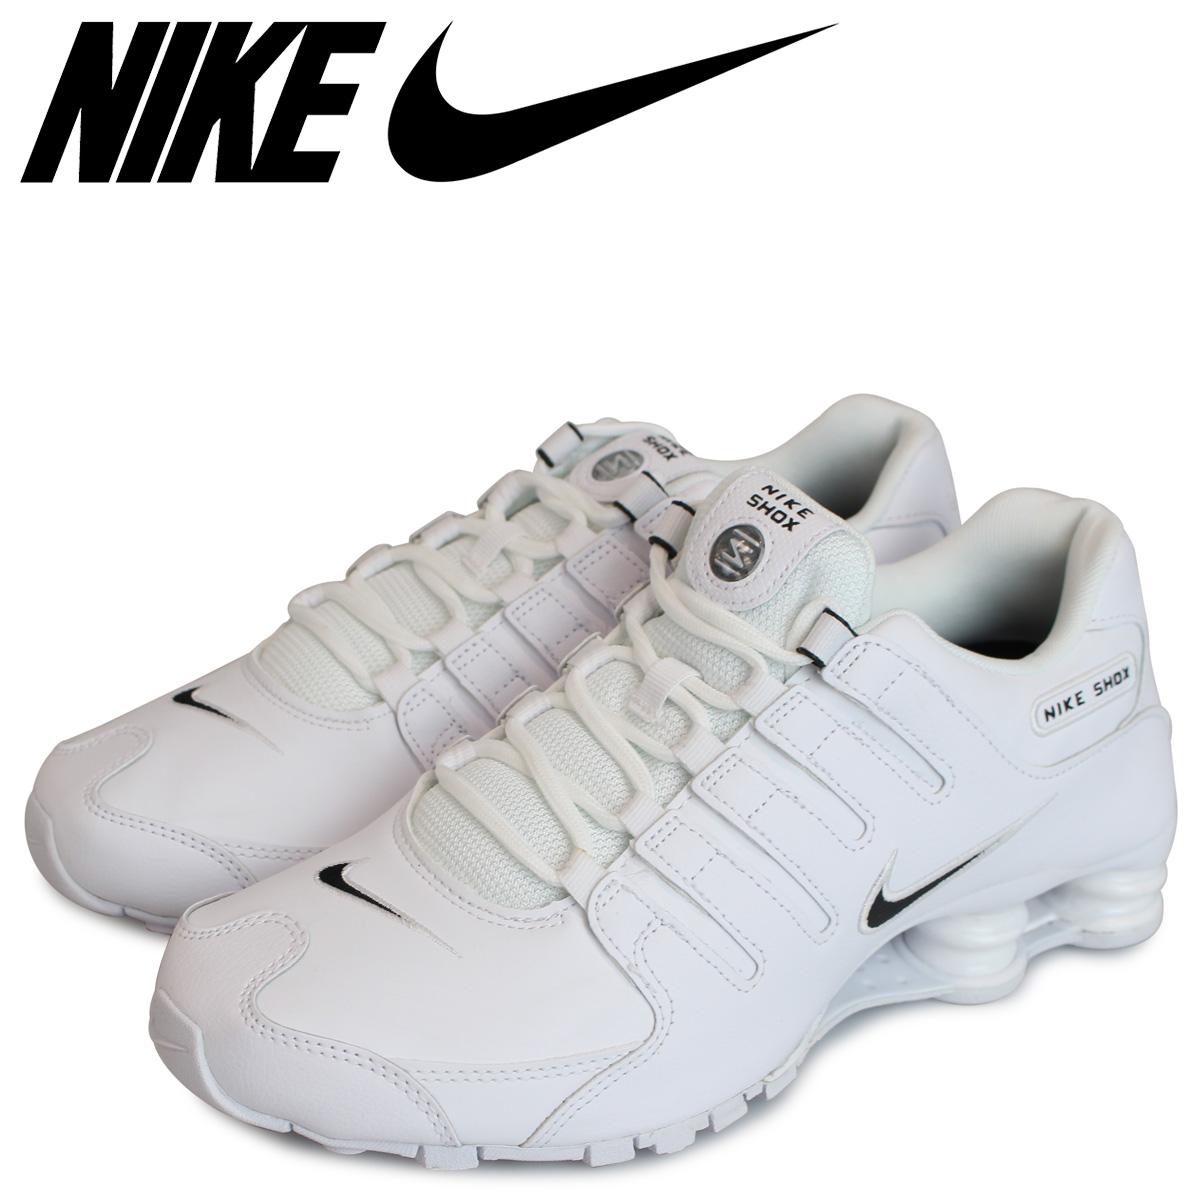 size 40 9a505 dae0f NIKE Nike shocks sneakers men SHOX NZ white white 852,629-300